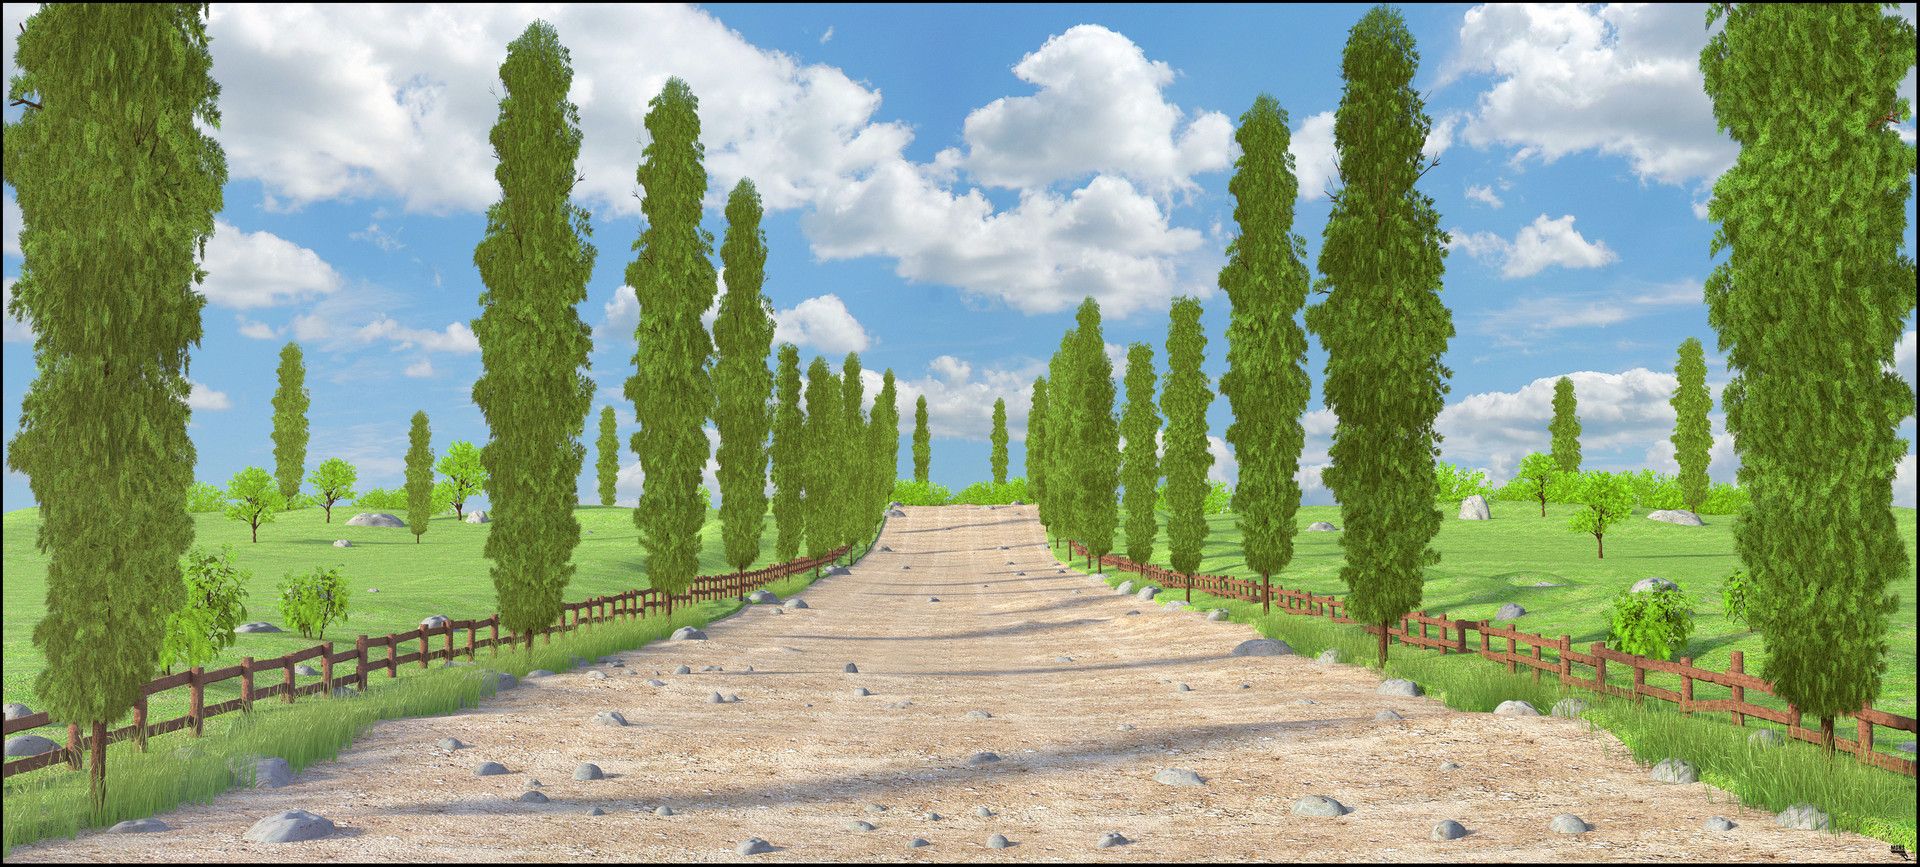 Marc mons path1